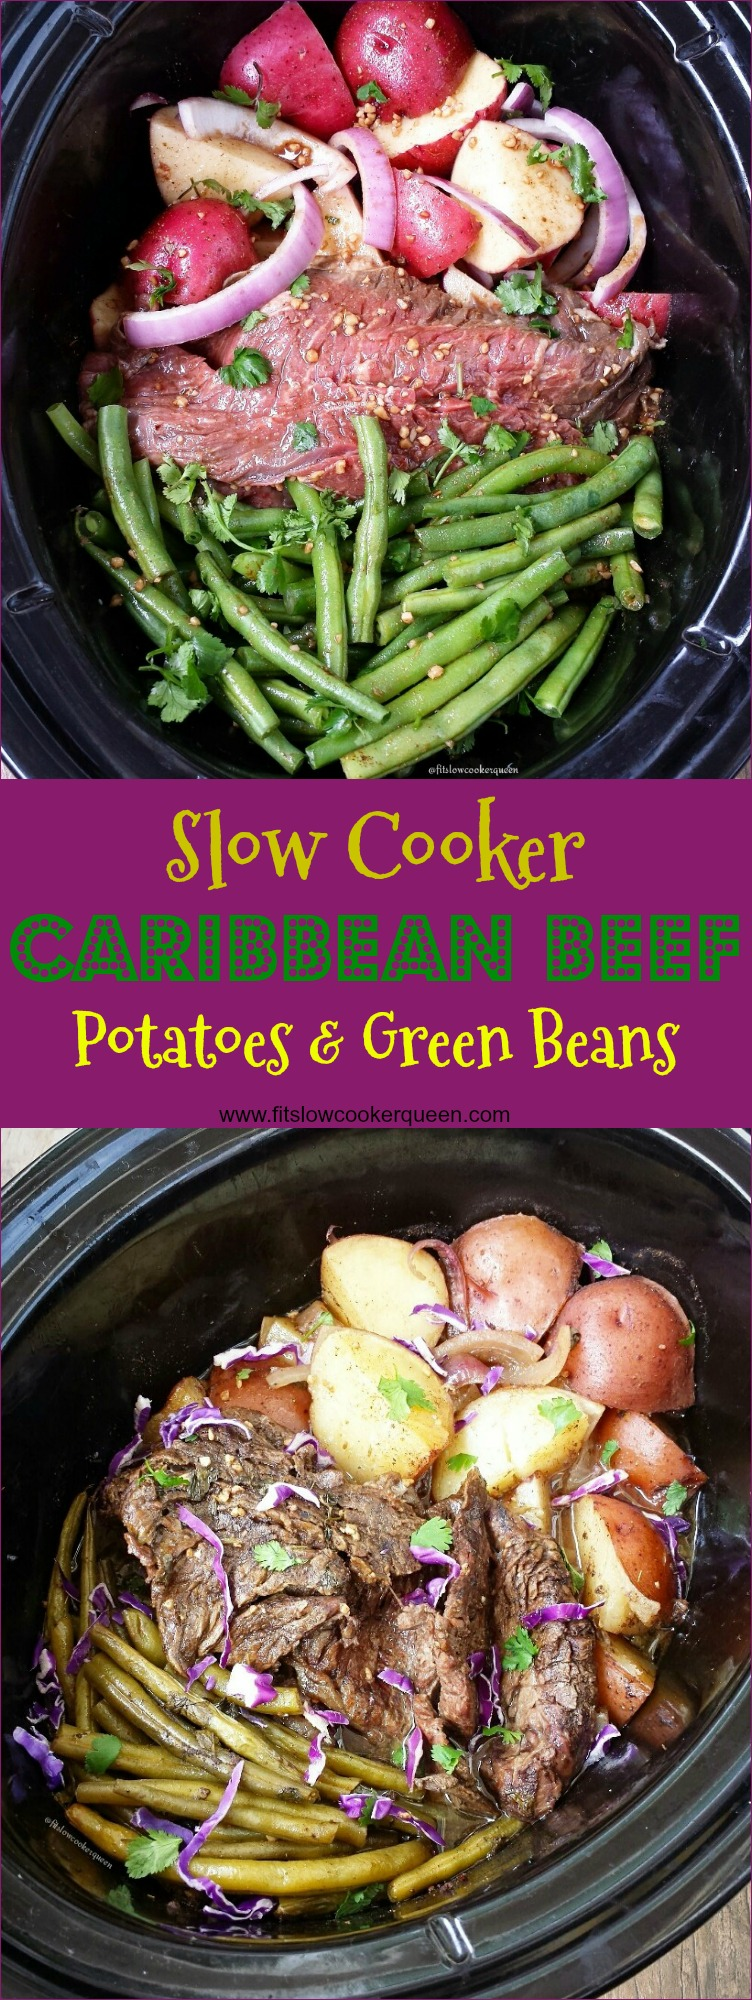 slow cooker caribbean beef potatoes green beans pin